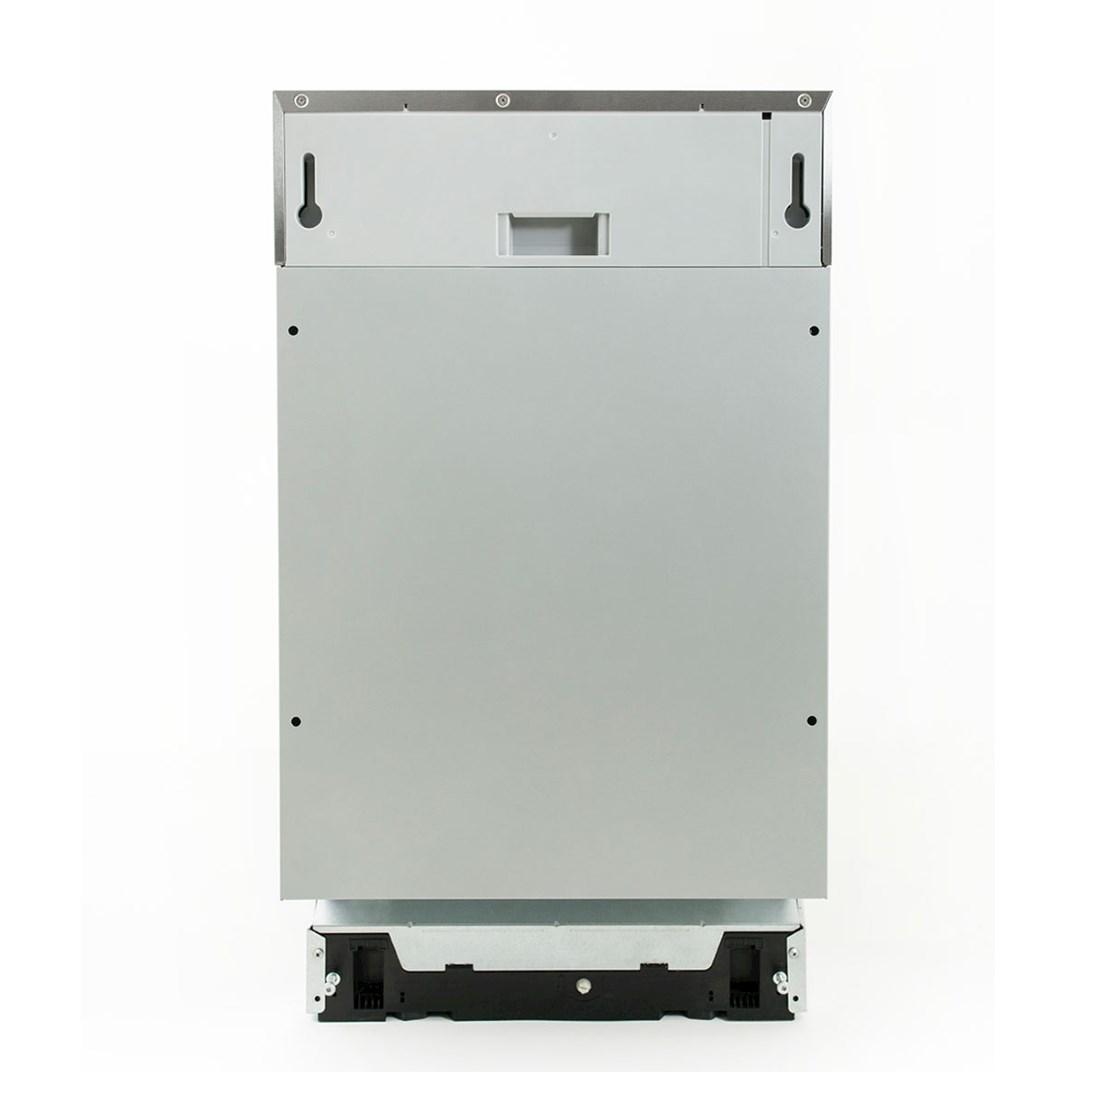 Lava-Louças de Embutir Elettromec 11 Serviços Inox Sem Revestimento 45cm 220V